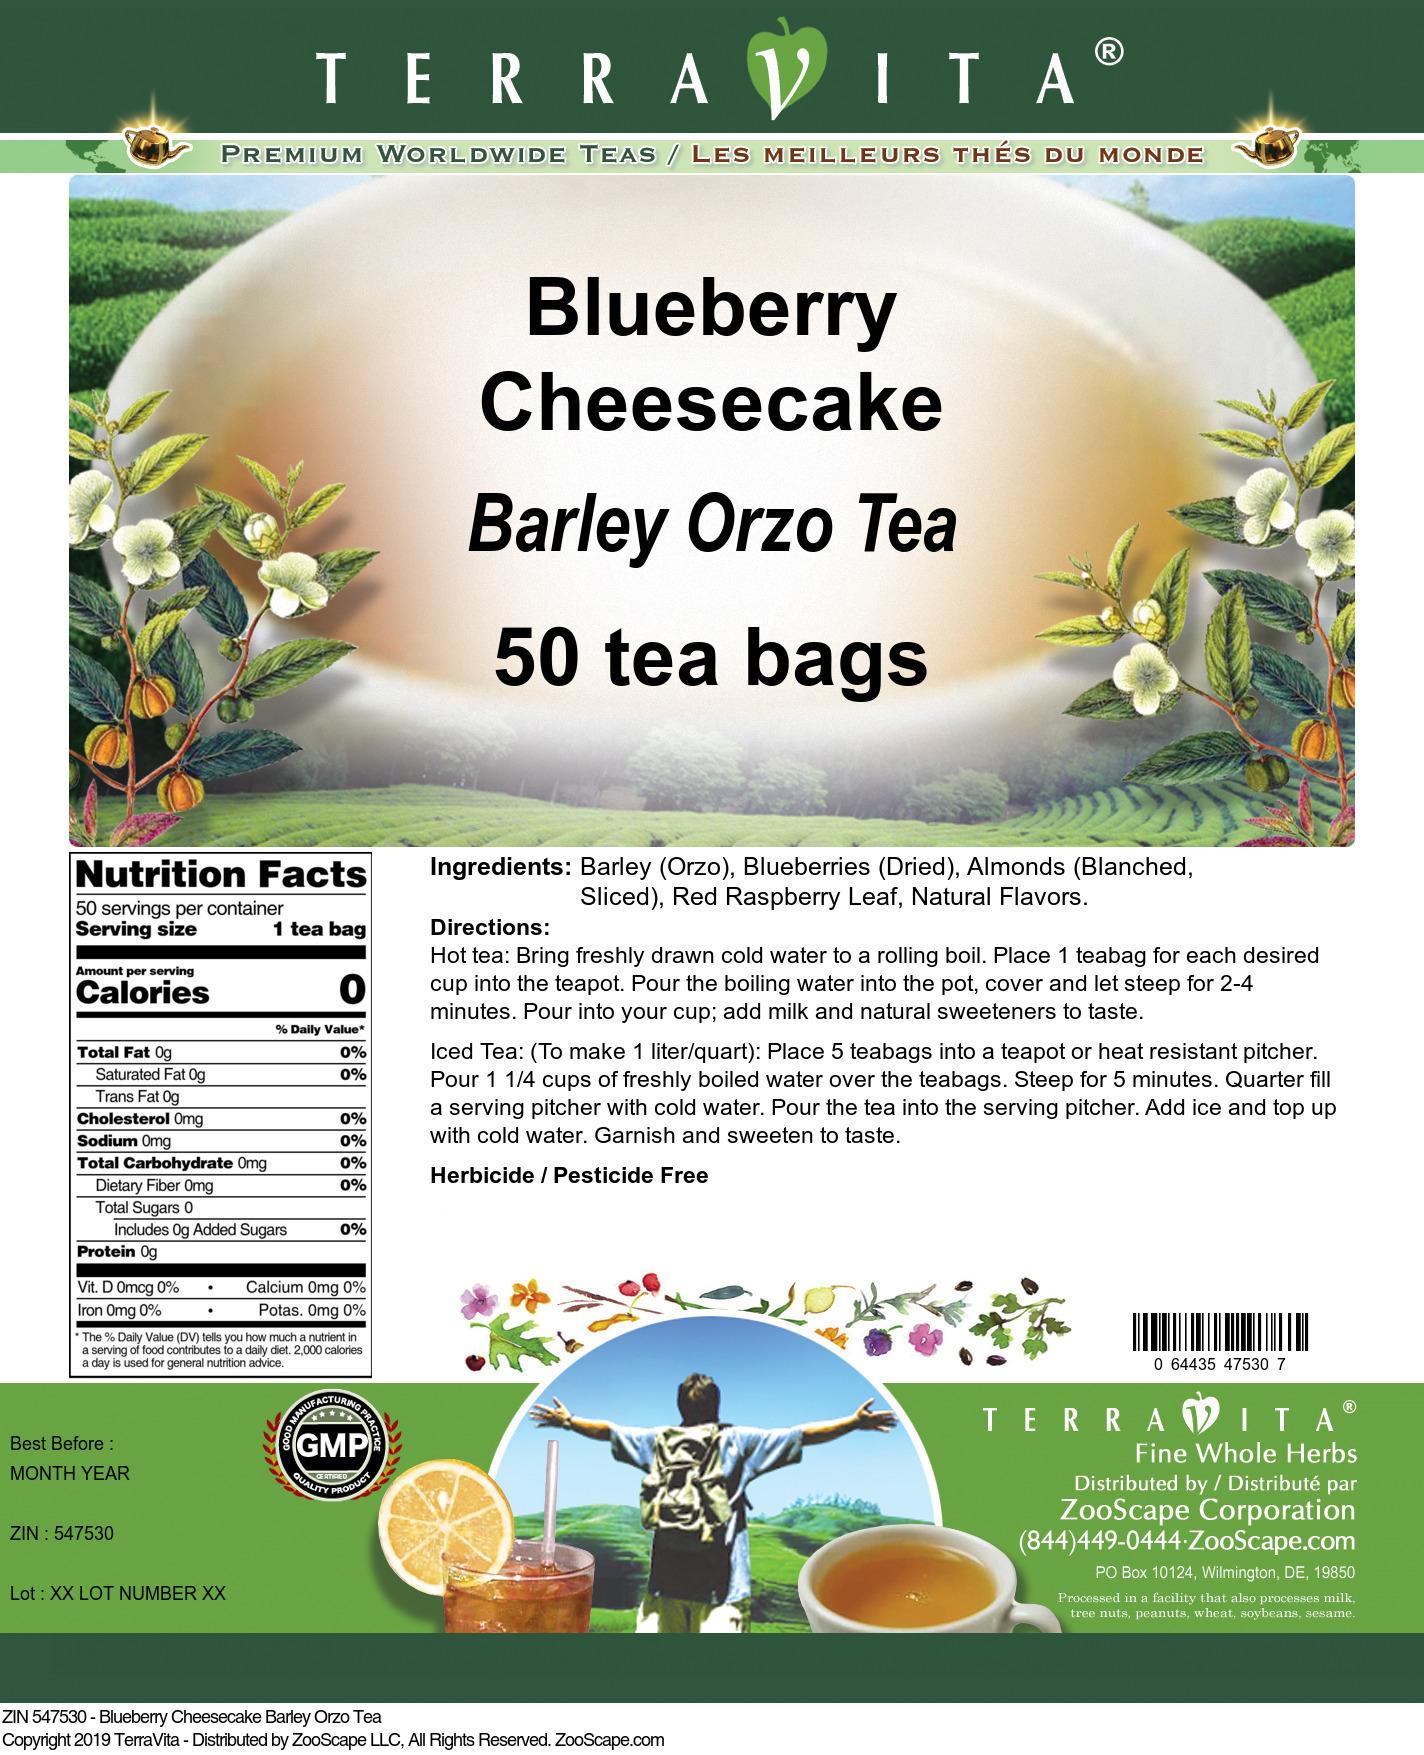 Blueberry Cheesecake Barley Orzo Tea